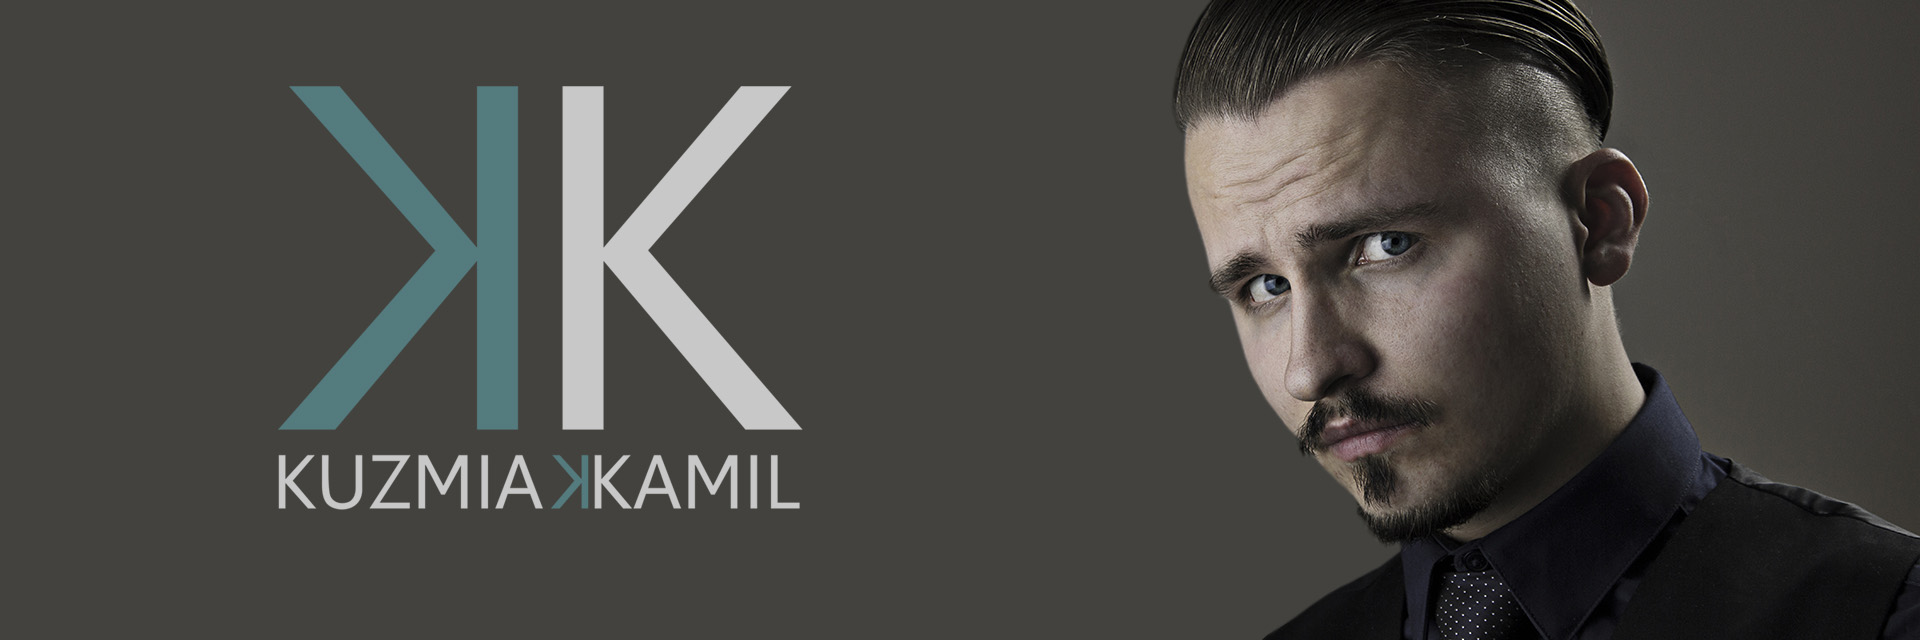 Biography of Kamil Kuzmiak